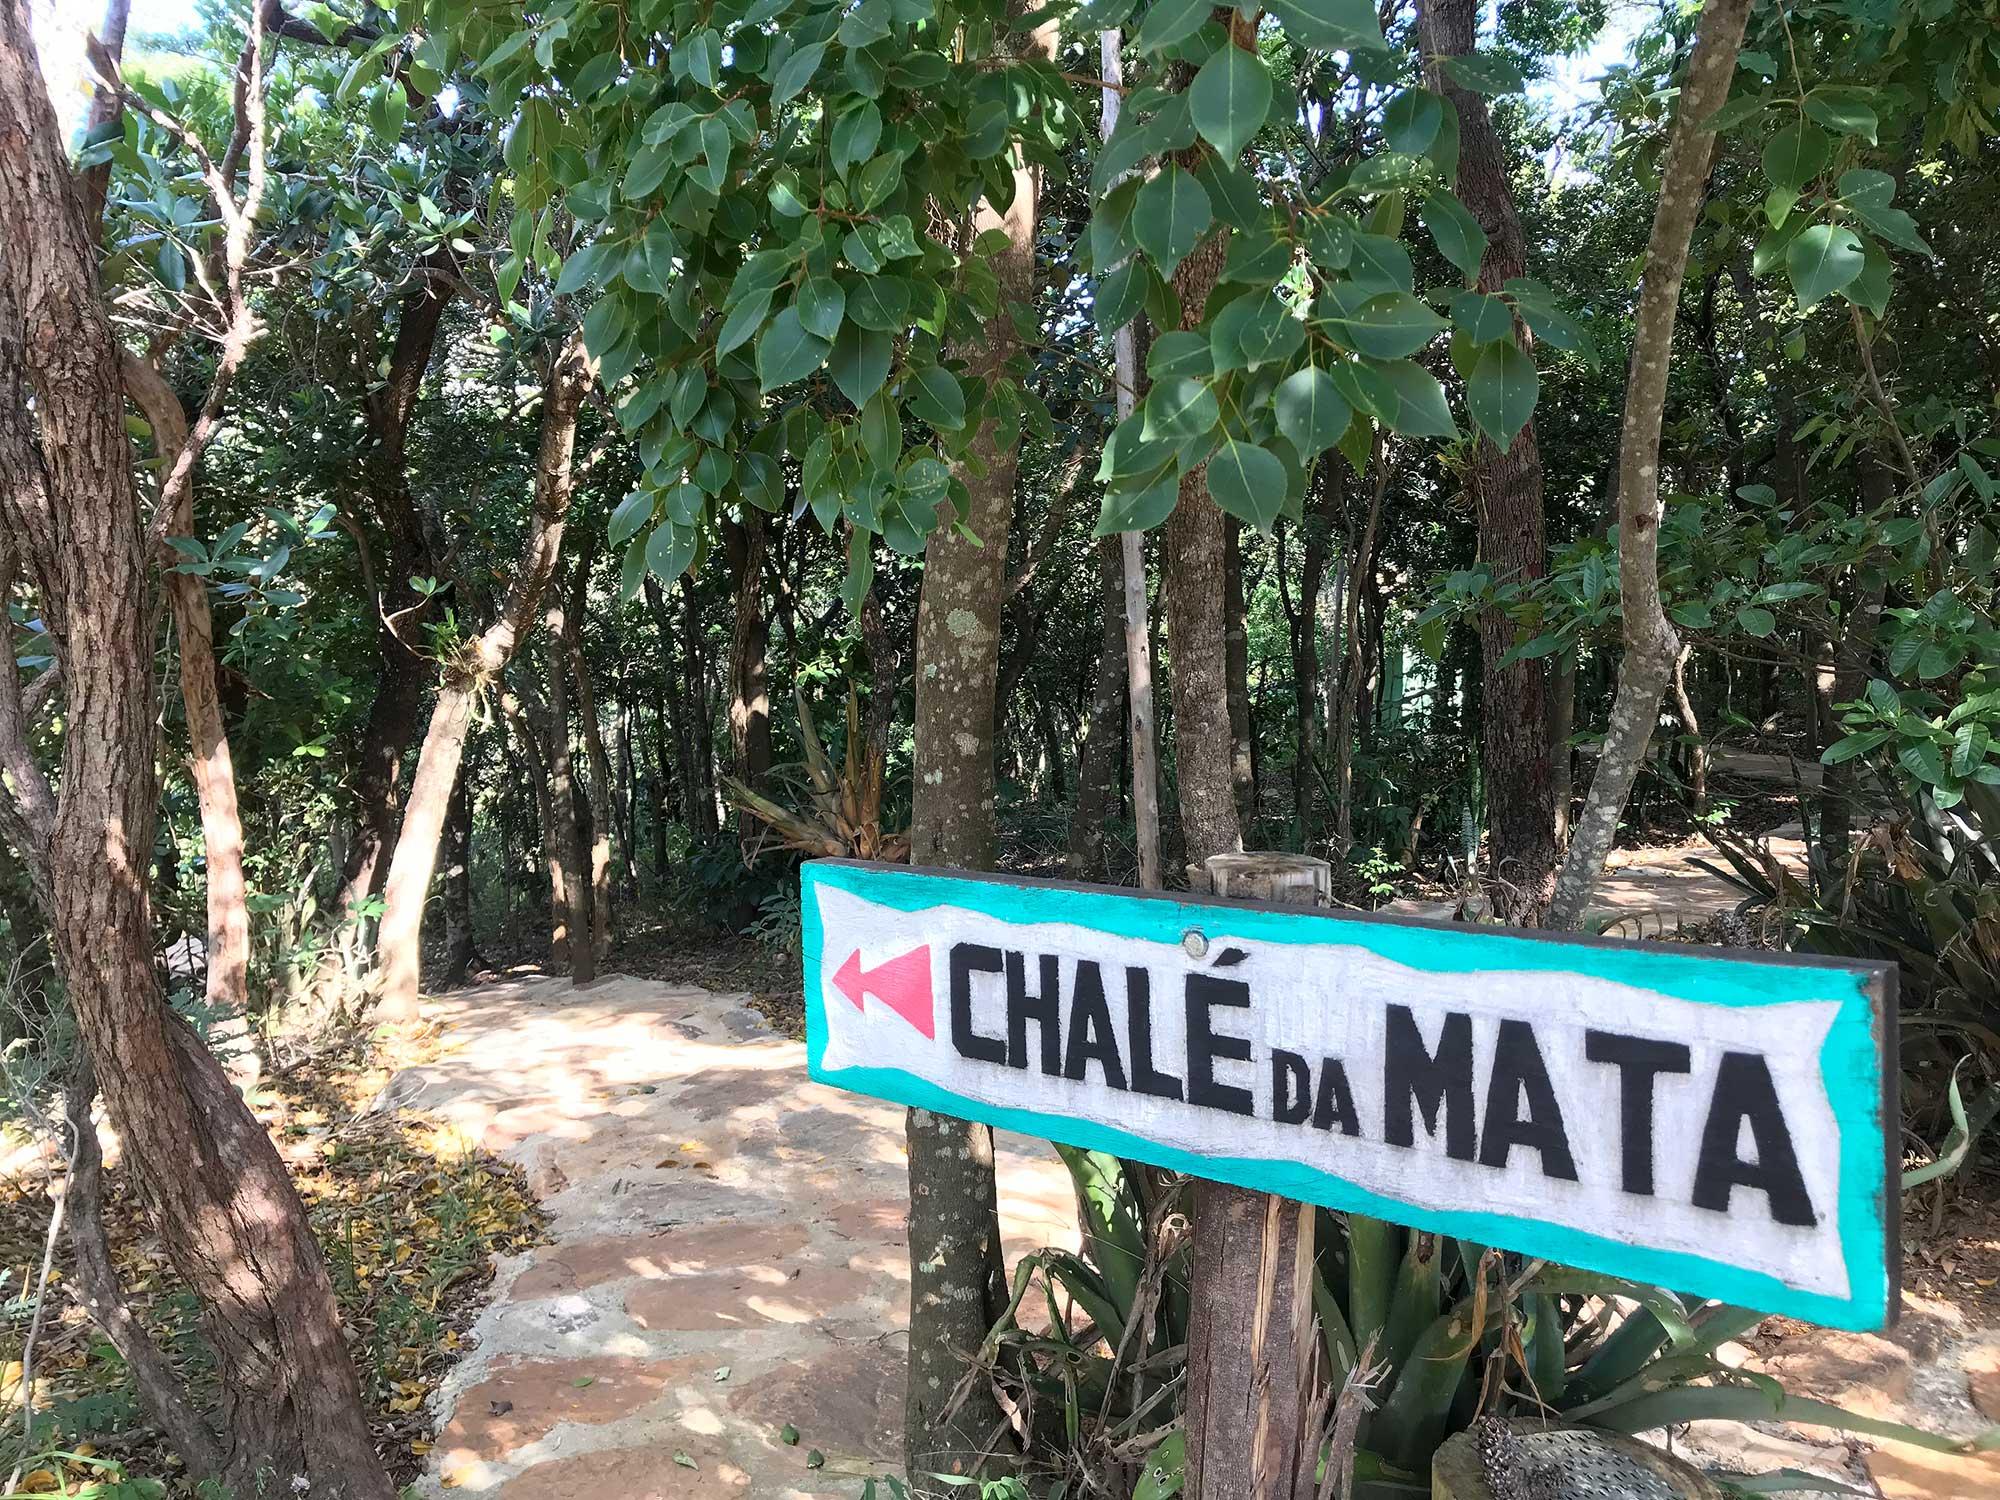 Casa do Teuler - Chalé Da Mata - Lapinha Da Serra MG - Pousada Hotel